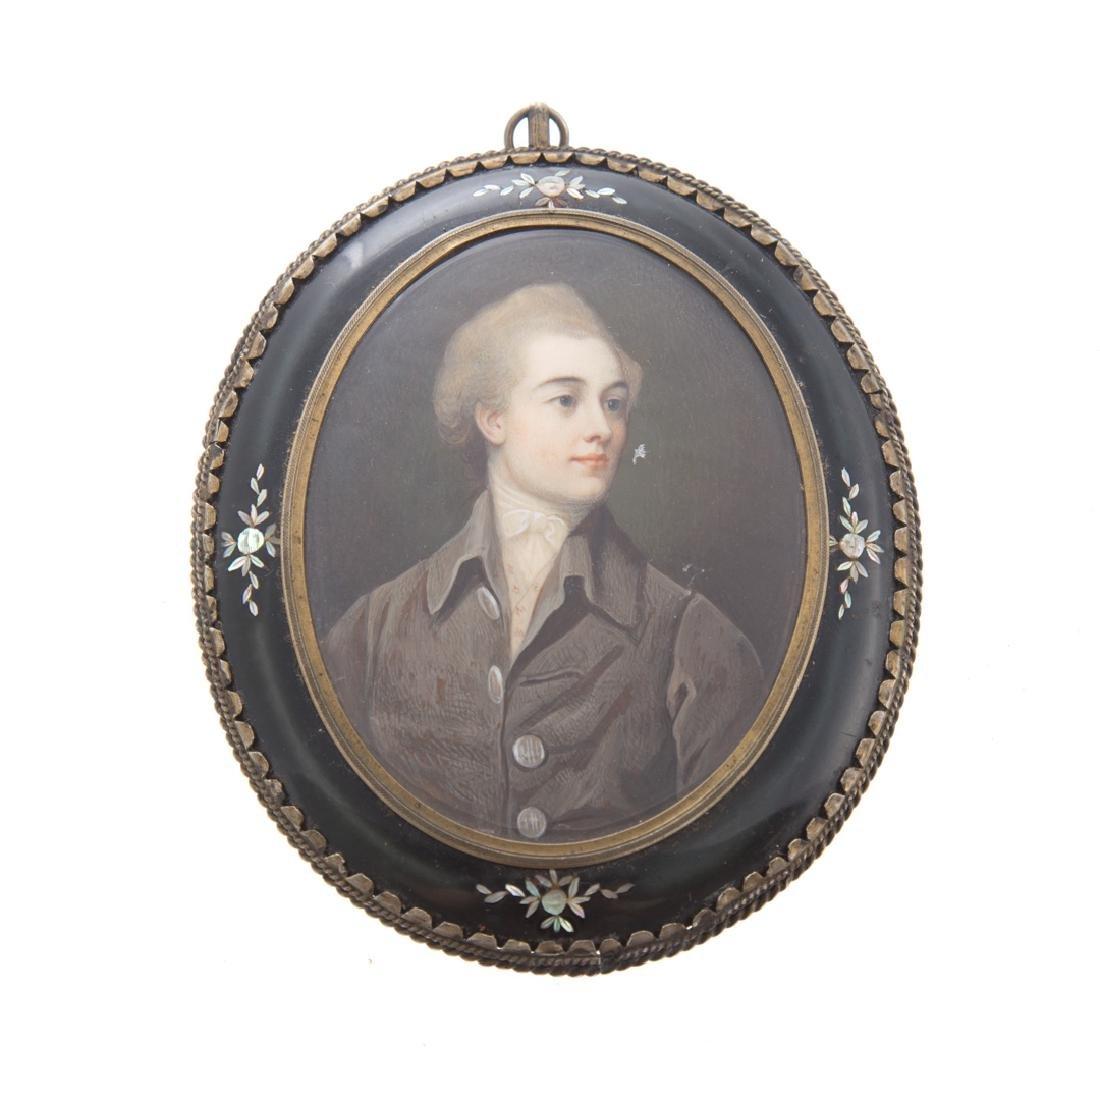 American School 18th century portrait miniature